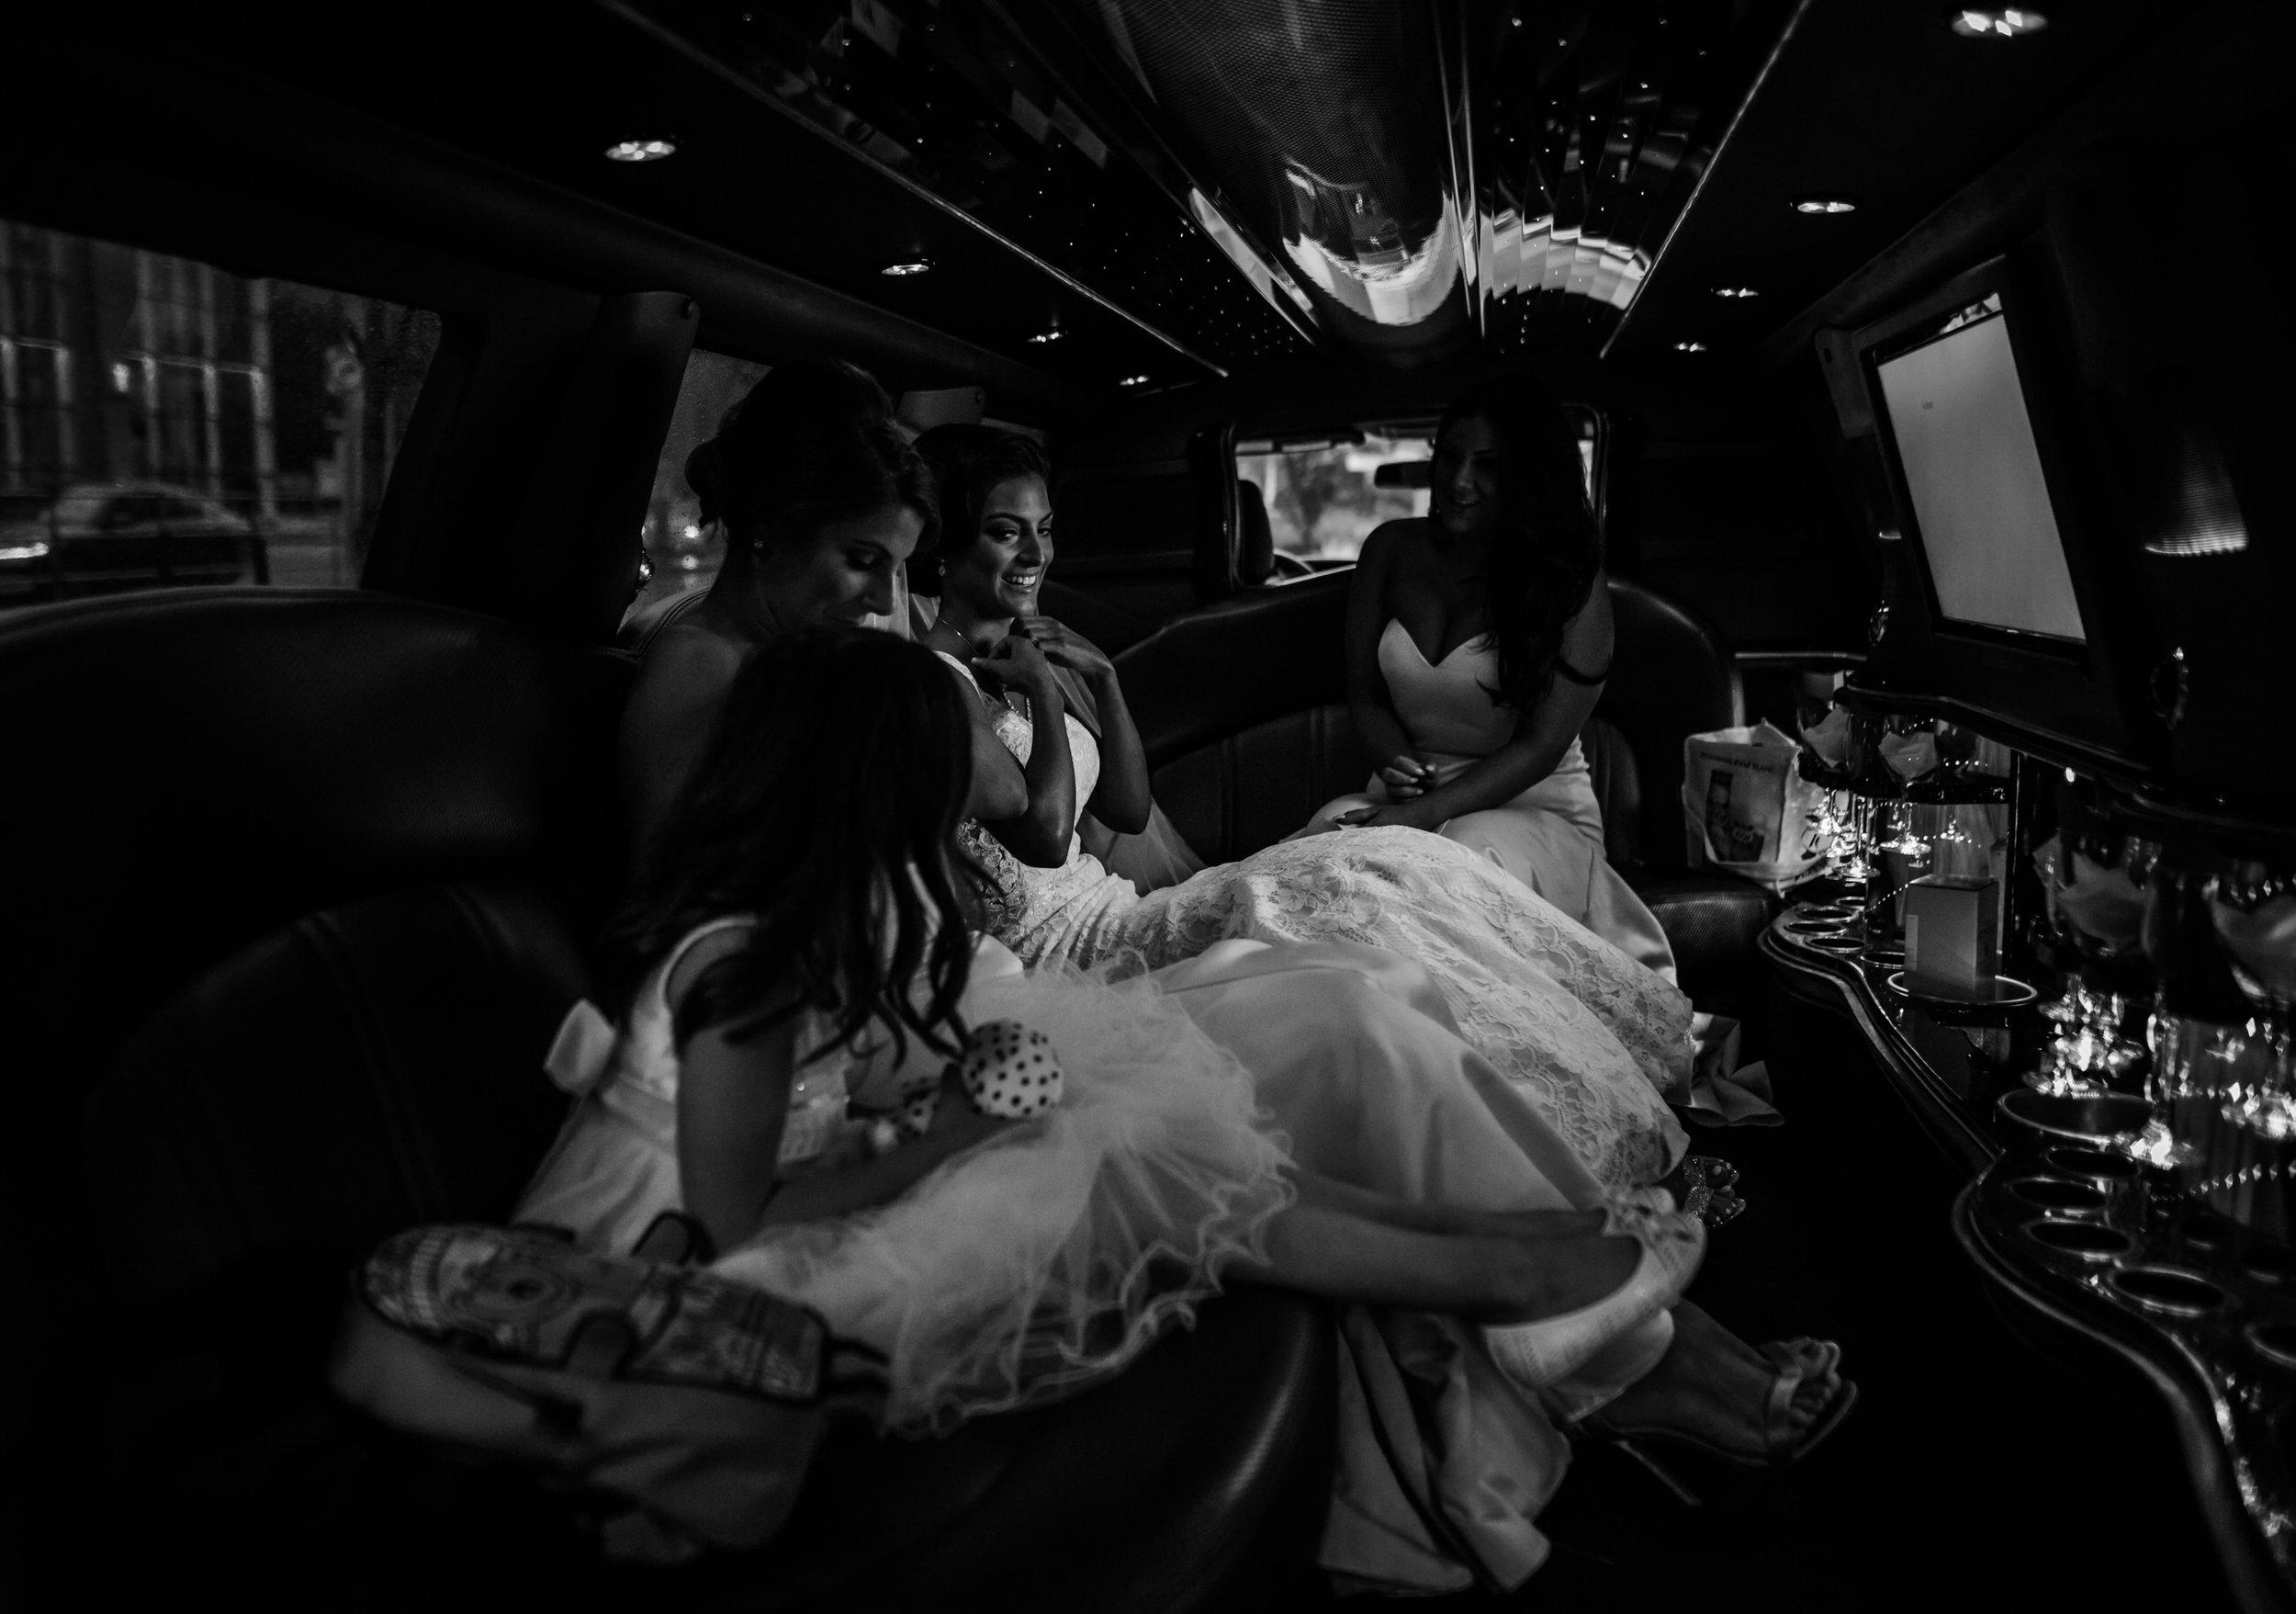 Pitt Meadows Wedding Photographer - Sky Hangar Wedding Photos - Vancouver Wedding Photographer & Videographer - Sunshine Coast Wedding Photos - Sunshine Coast Wedding Photographer - Jennifer Picard Photography - IMG_5525.jpg